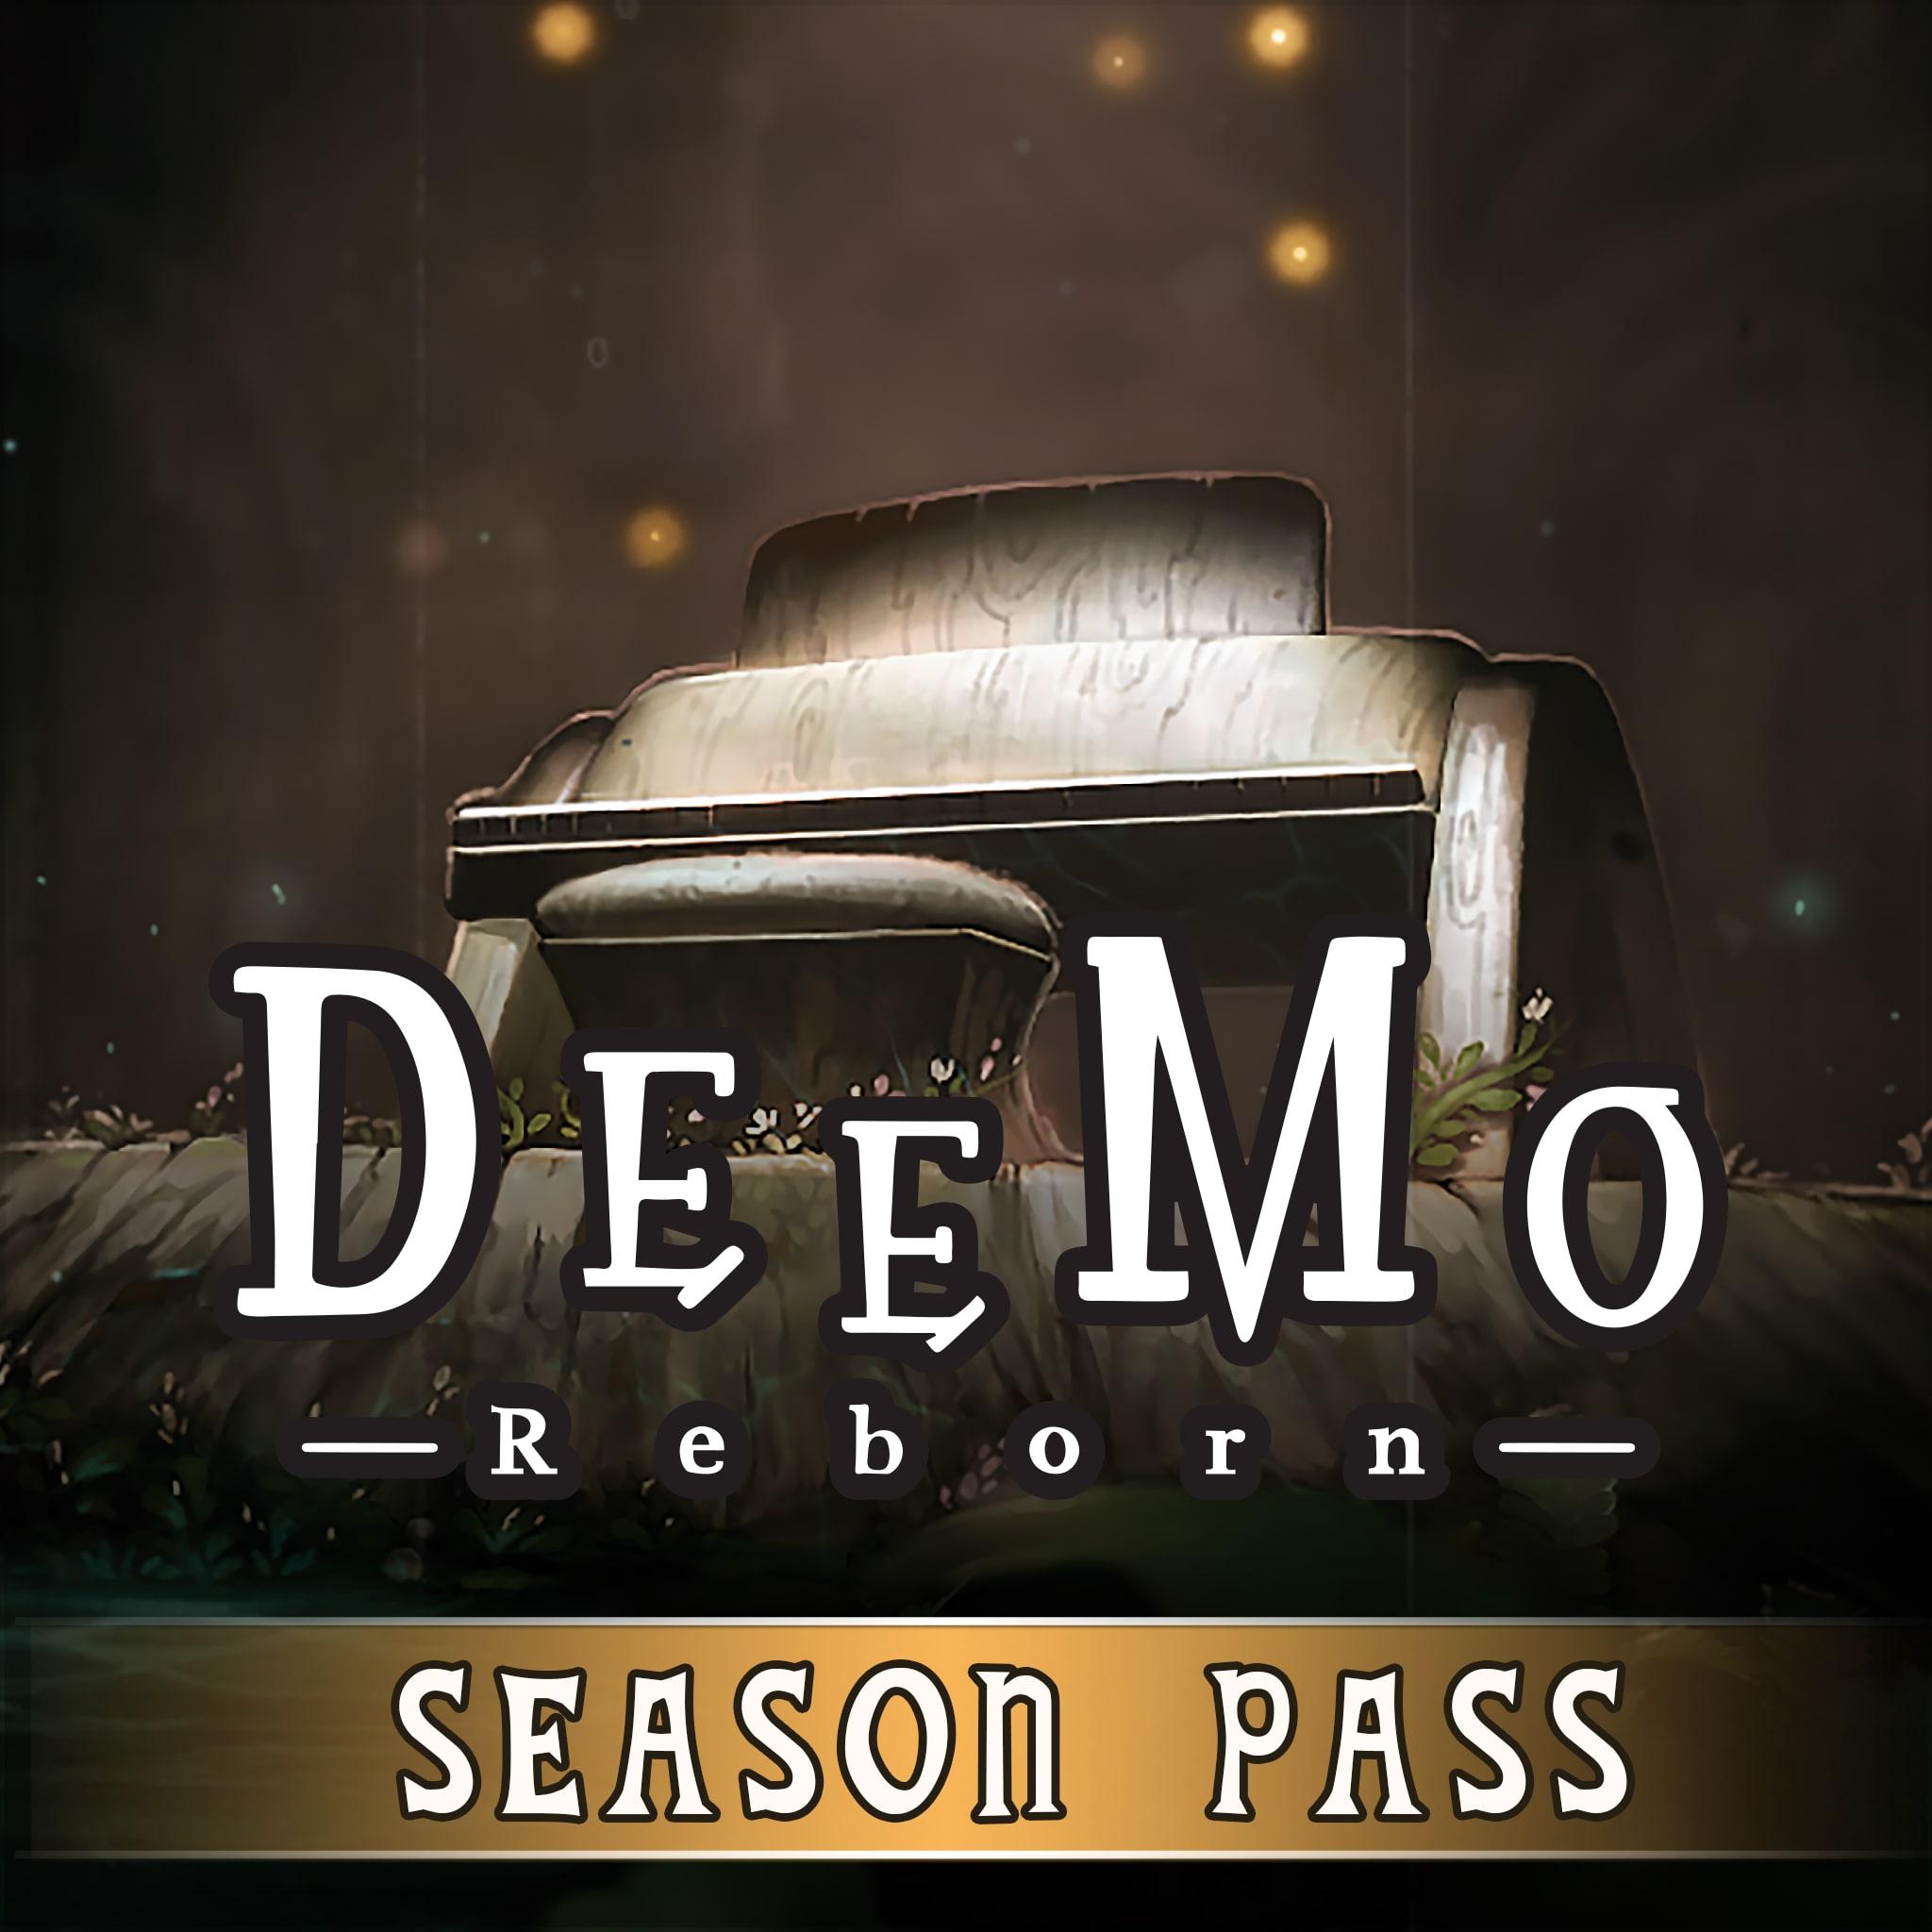 DEEMO -Reborn- Classic Song Packs Season Pass